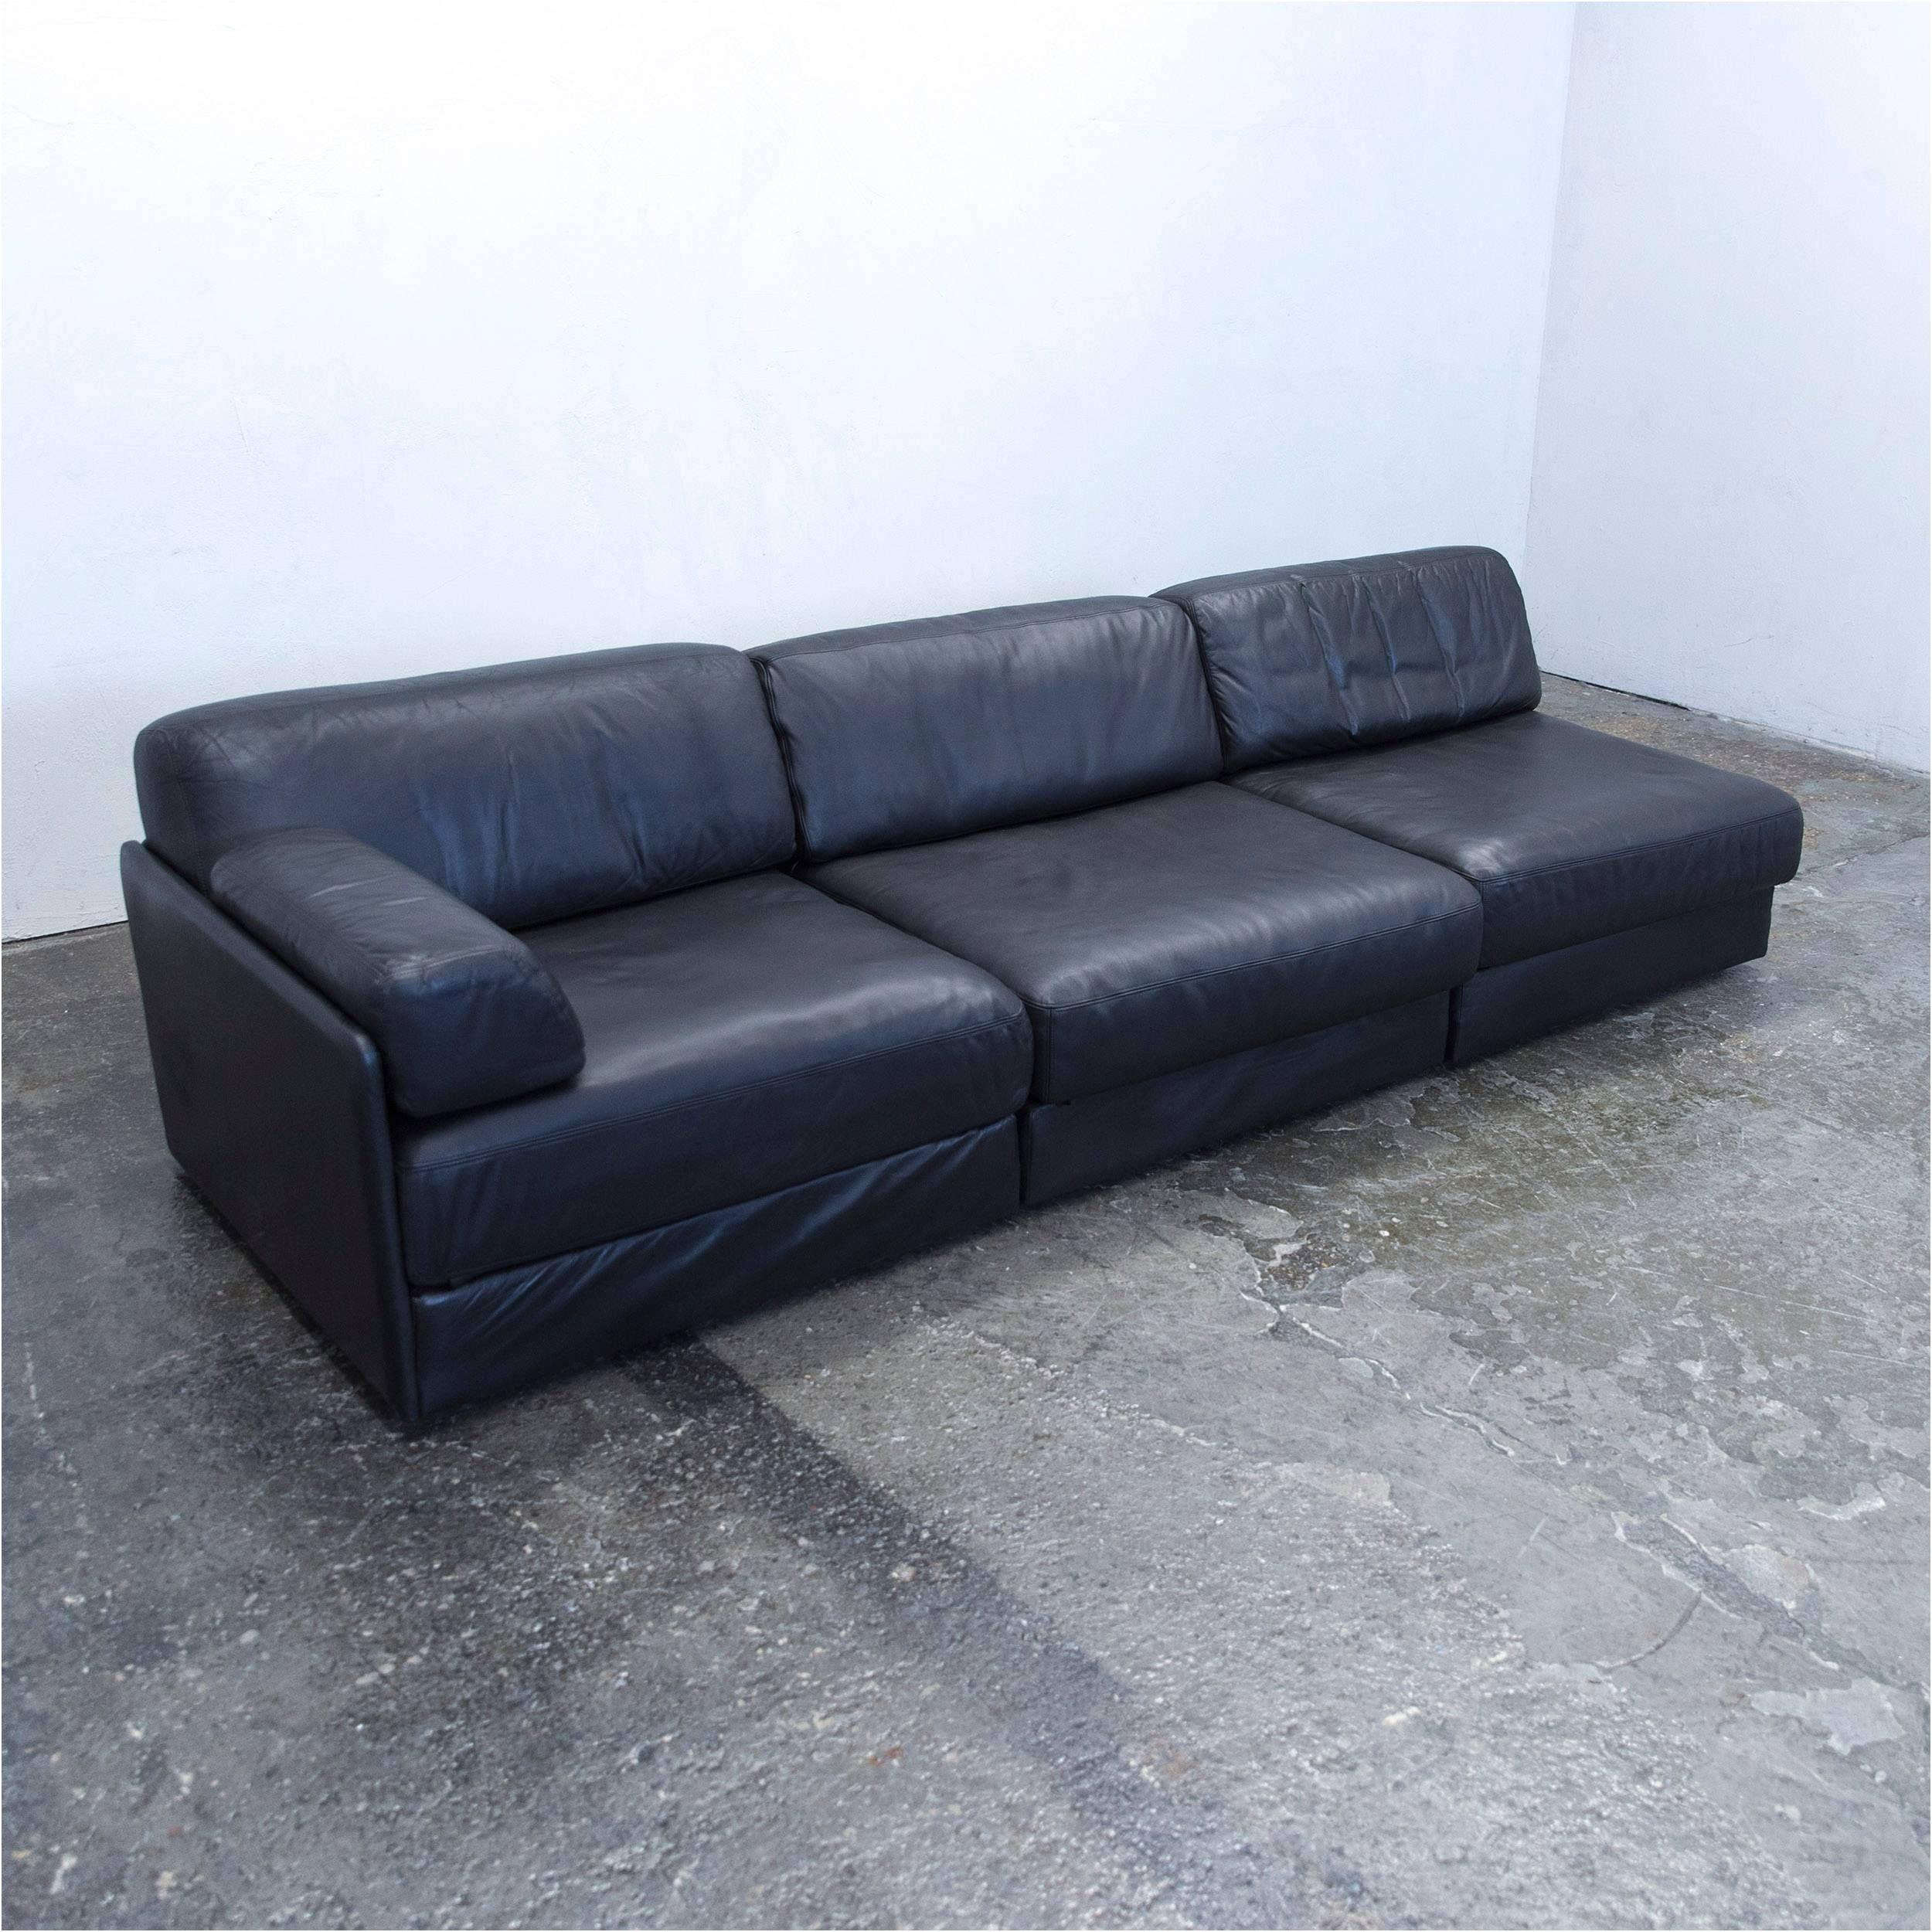 Kreativ Sofa Leder Schwarz Couch Mobel Pinterest Couch Red